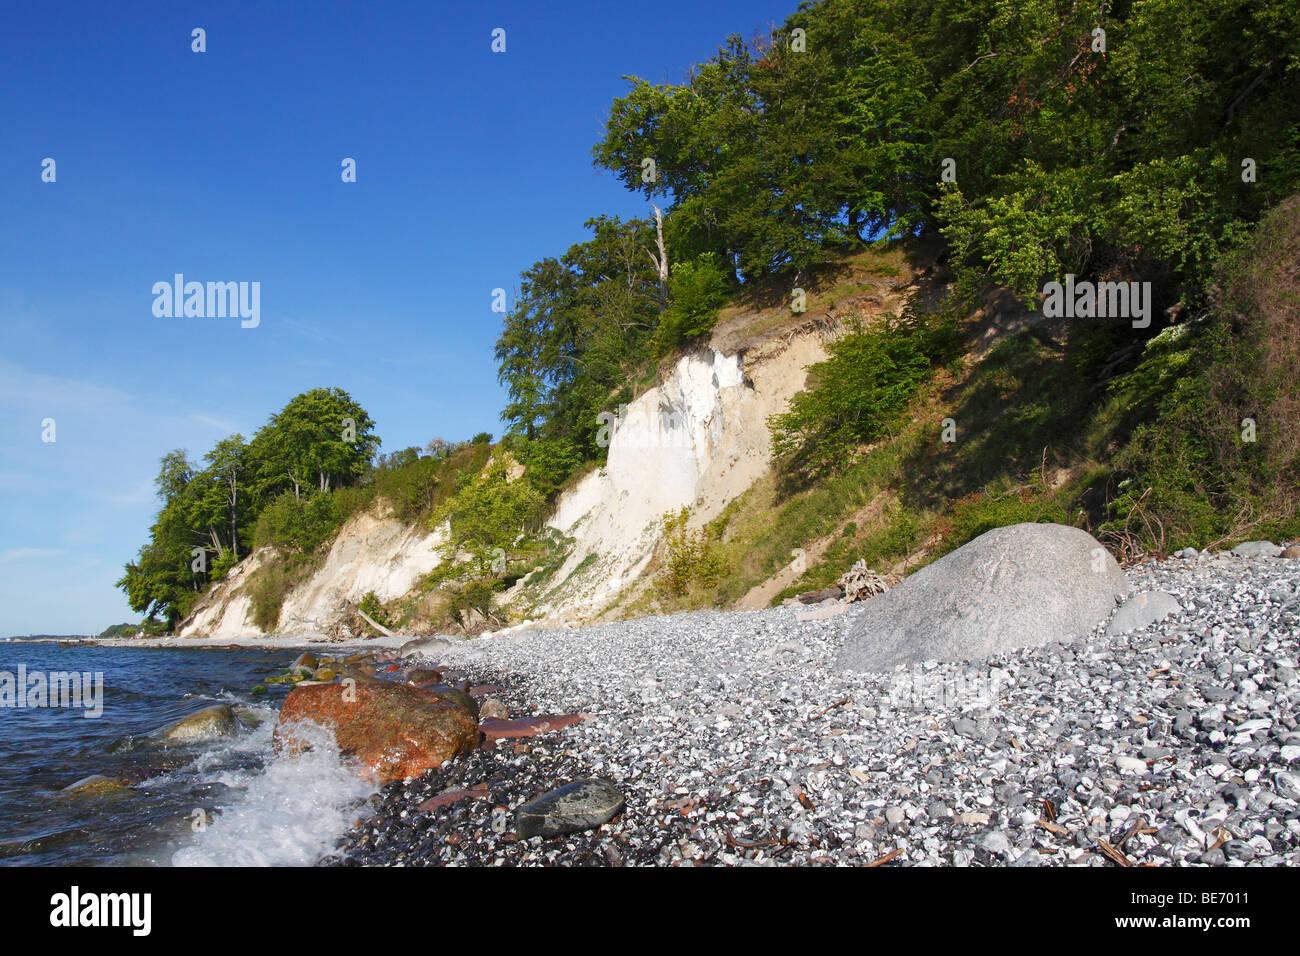 Chalk cliffs at the Baltic Sea coast, landscape in Jasmund National Park, Isle of Ruegen, Mecklenburg-Western-Pomerania, Stock Photo